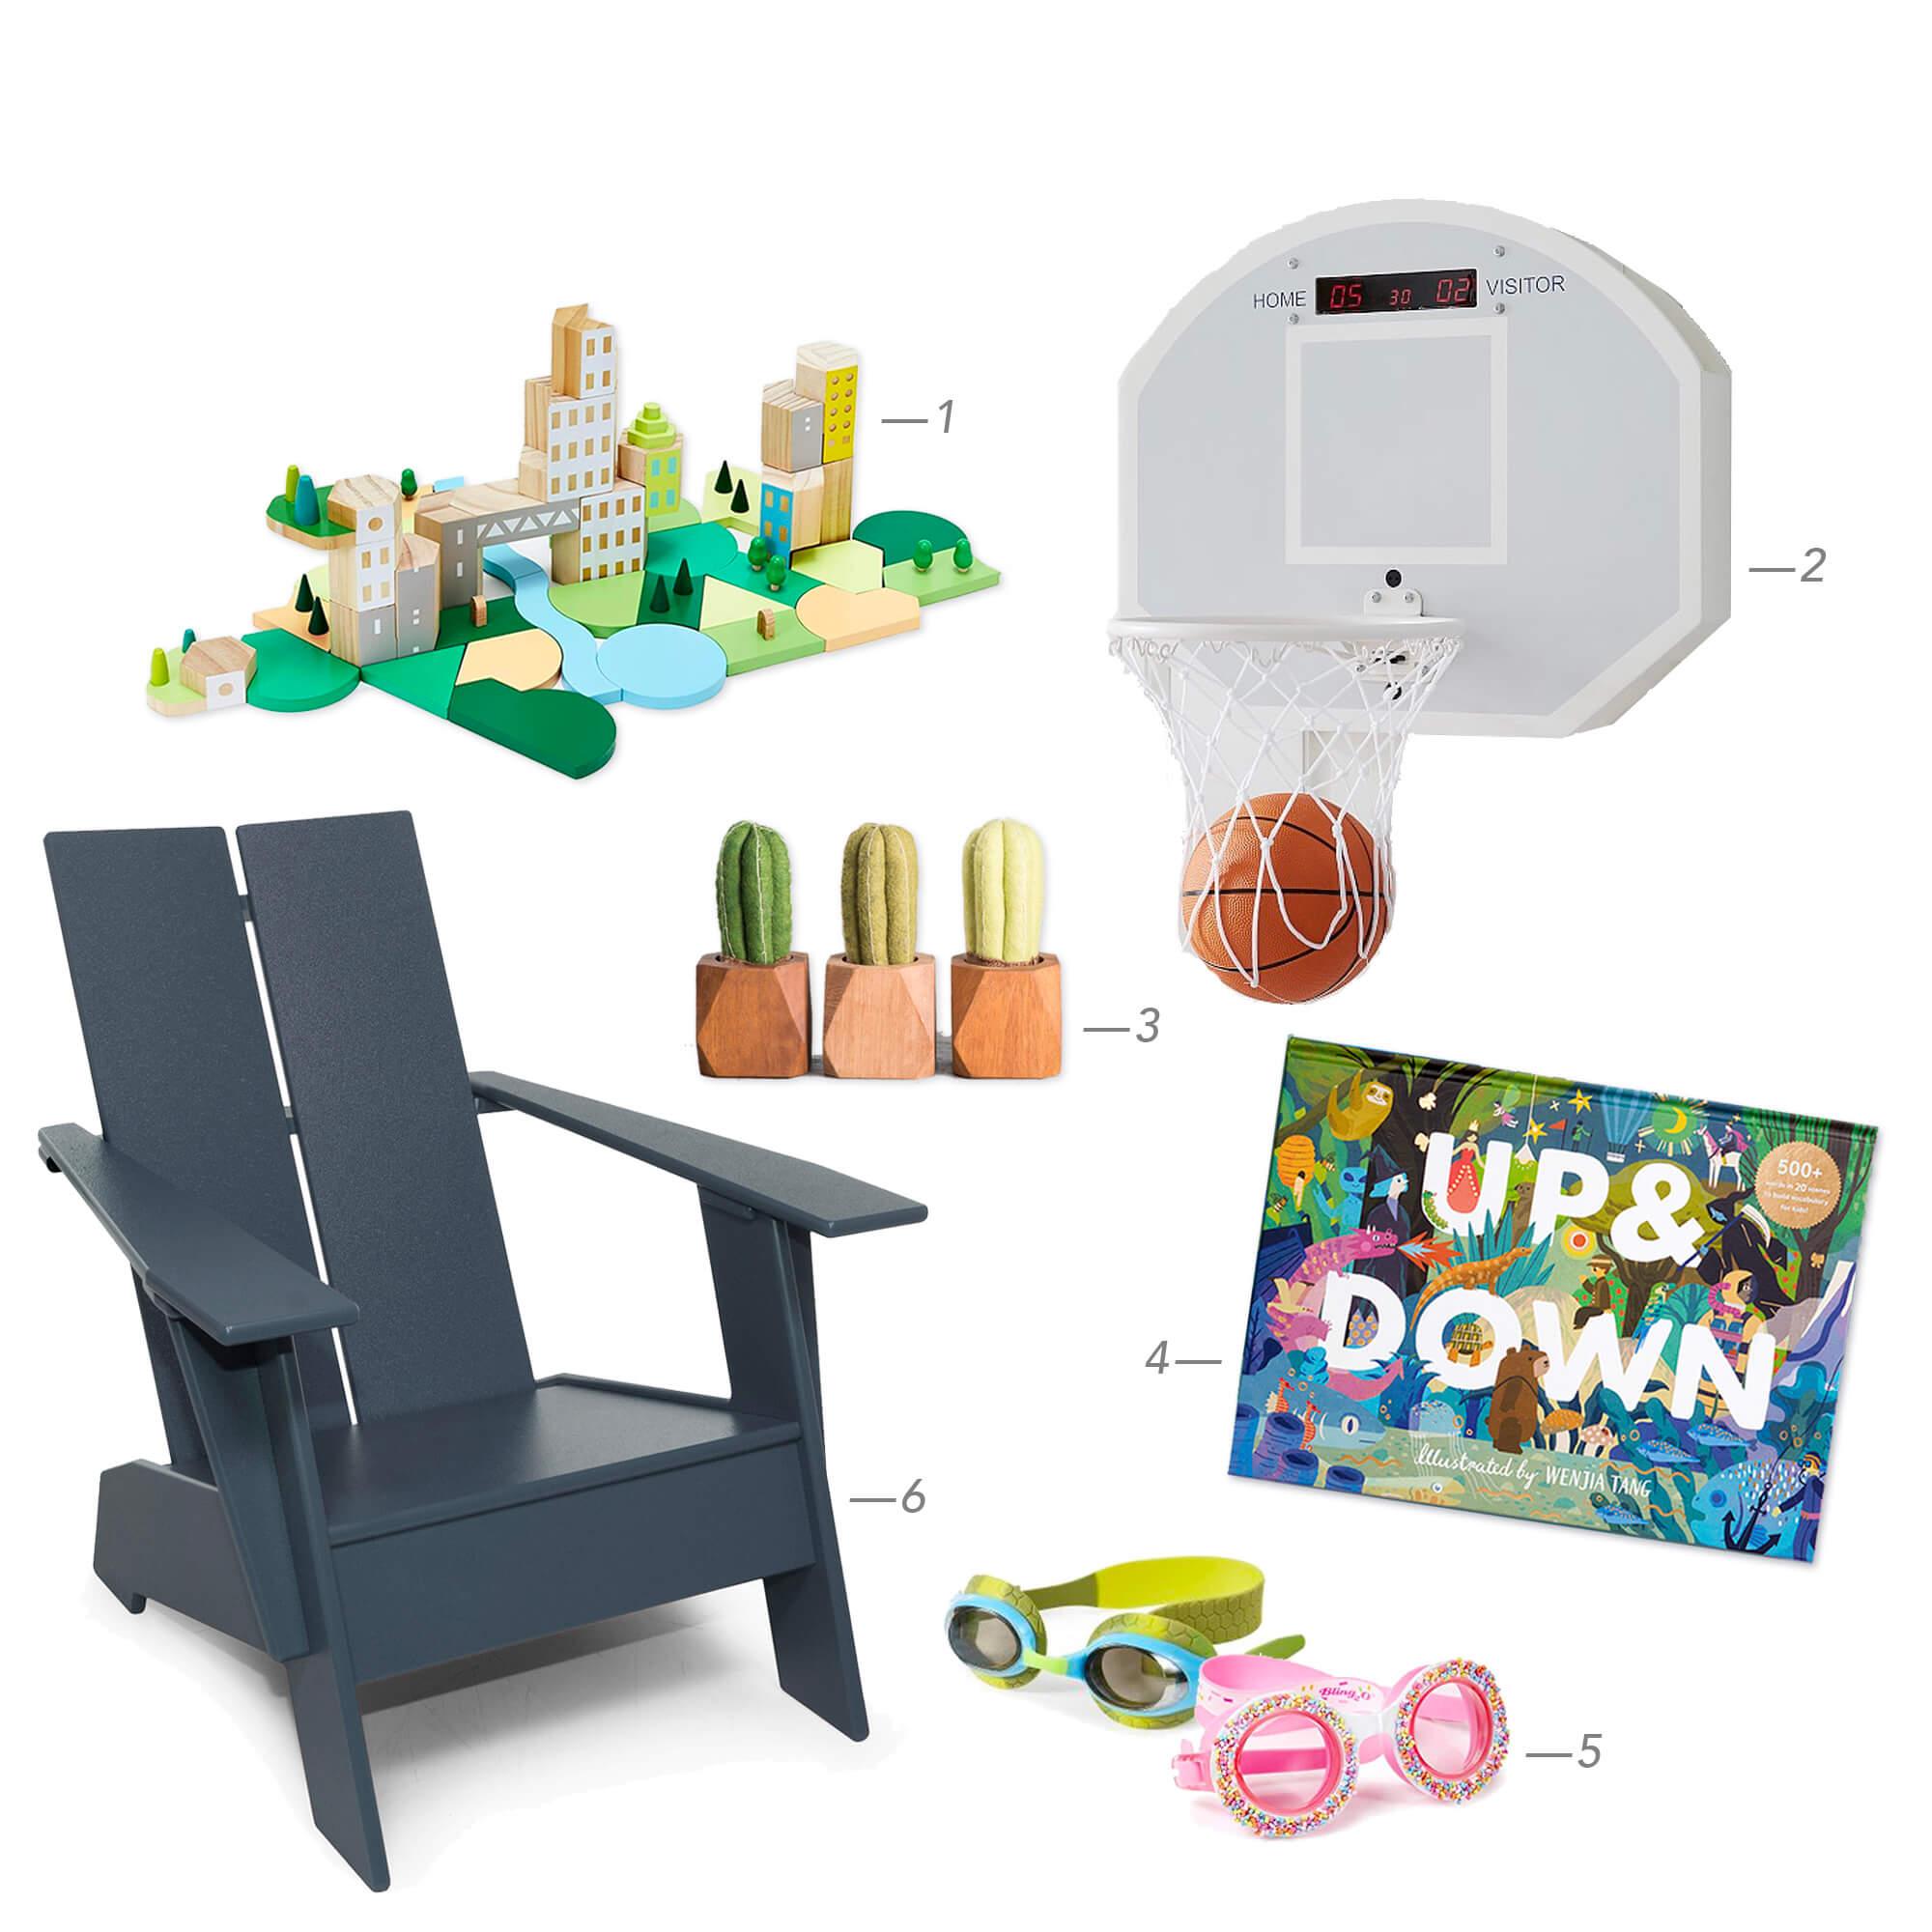 YardKit-Gift-Guide-Kids.jpg